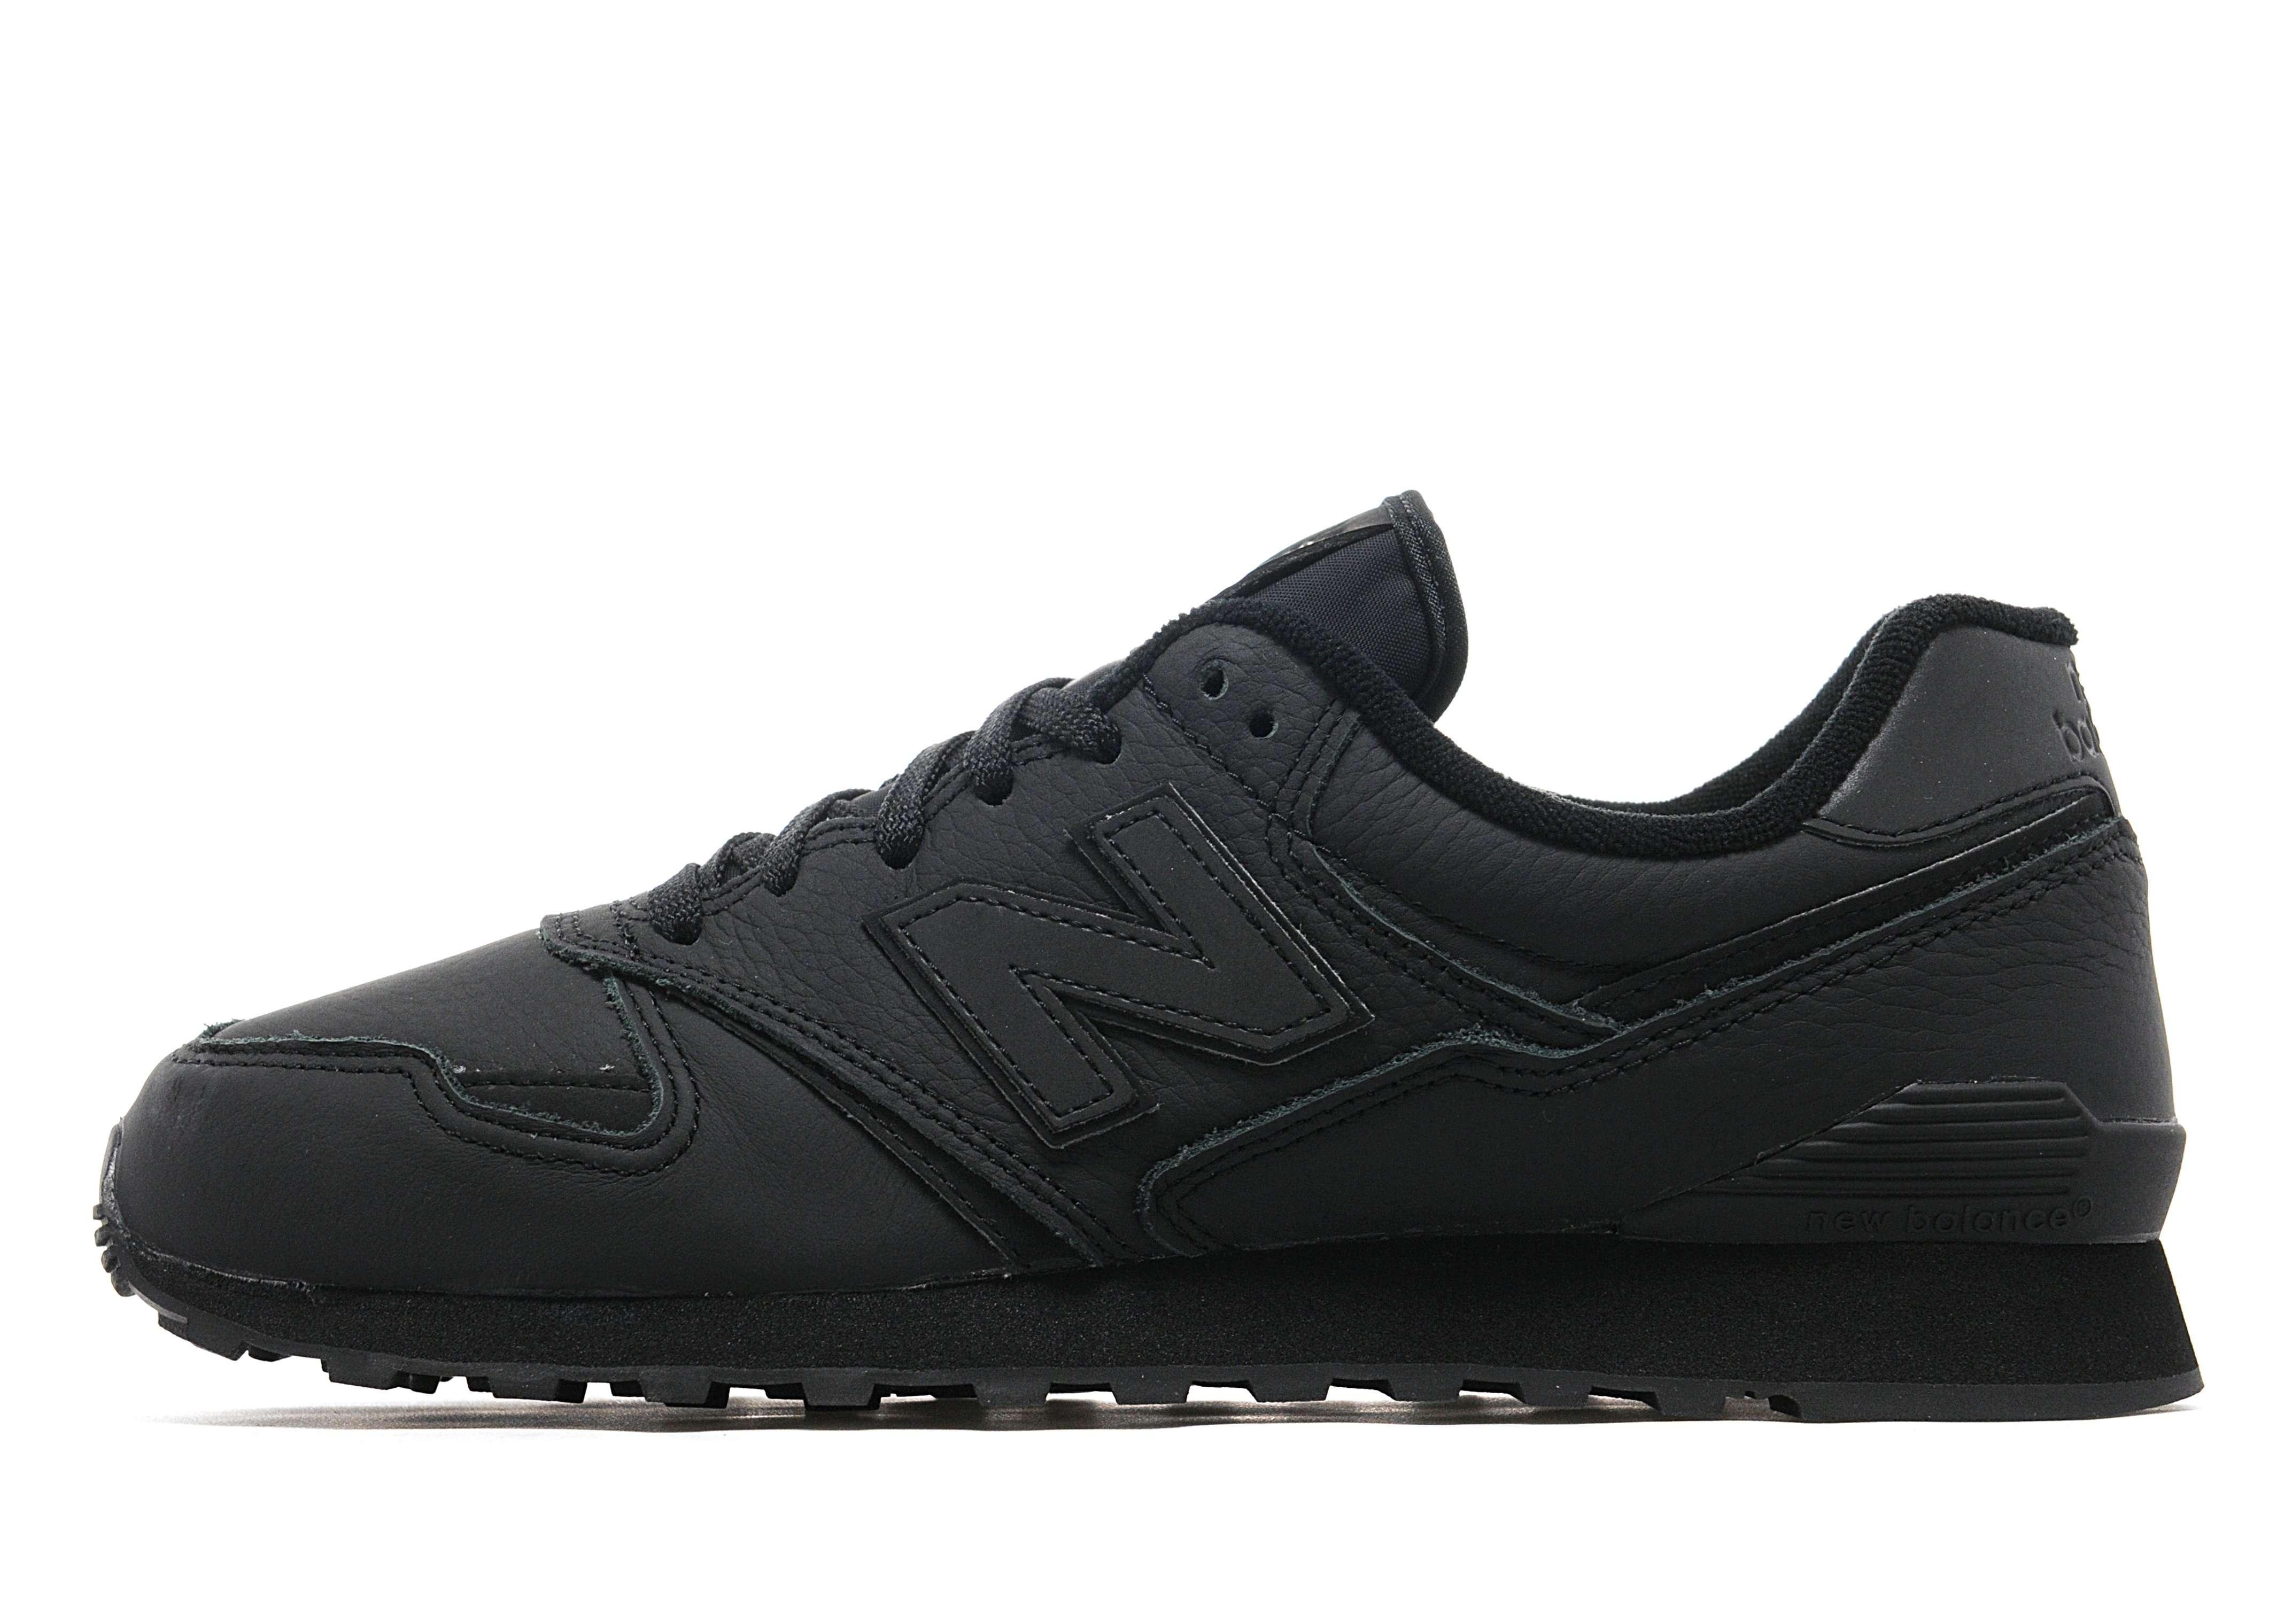 New Balance Black Leather